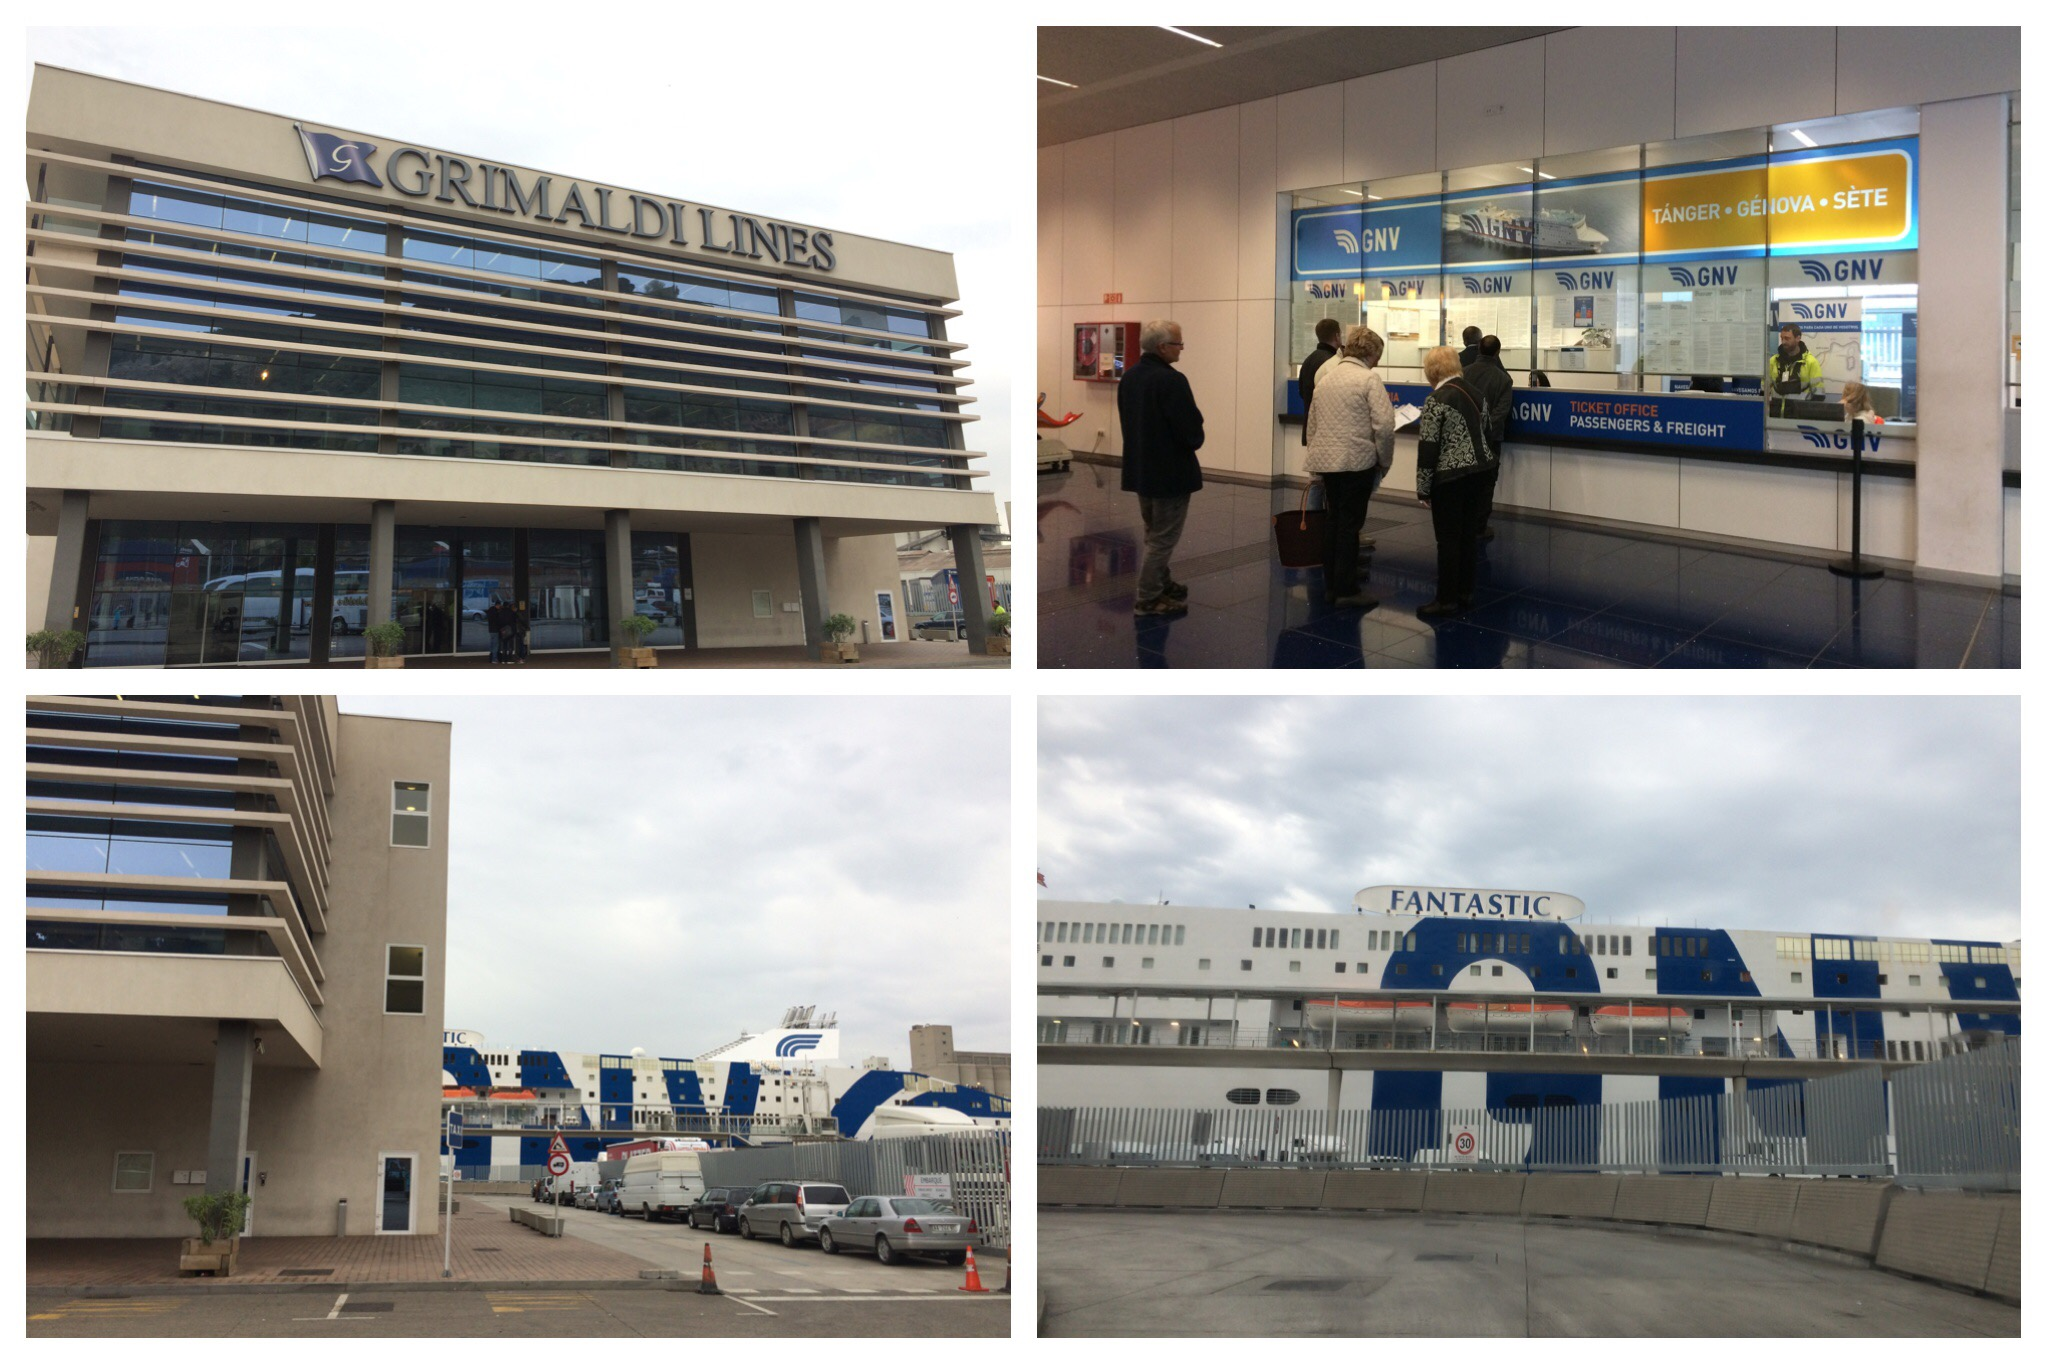 GNV ferry Barcelona to Genoa terminal building